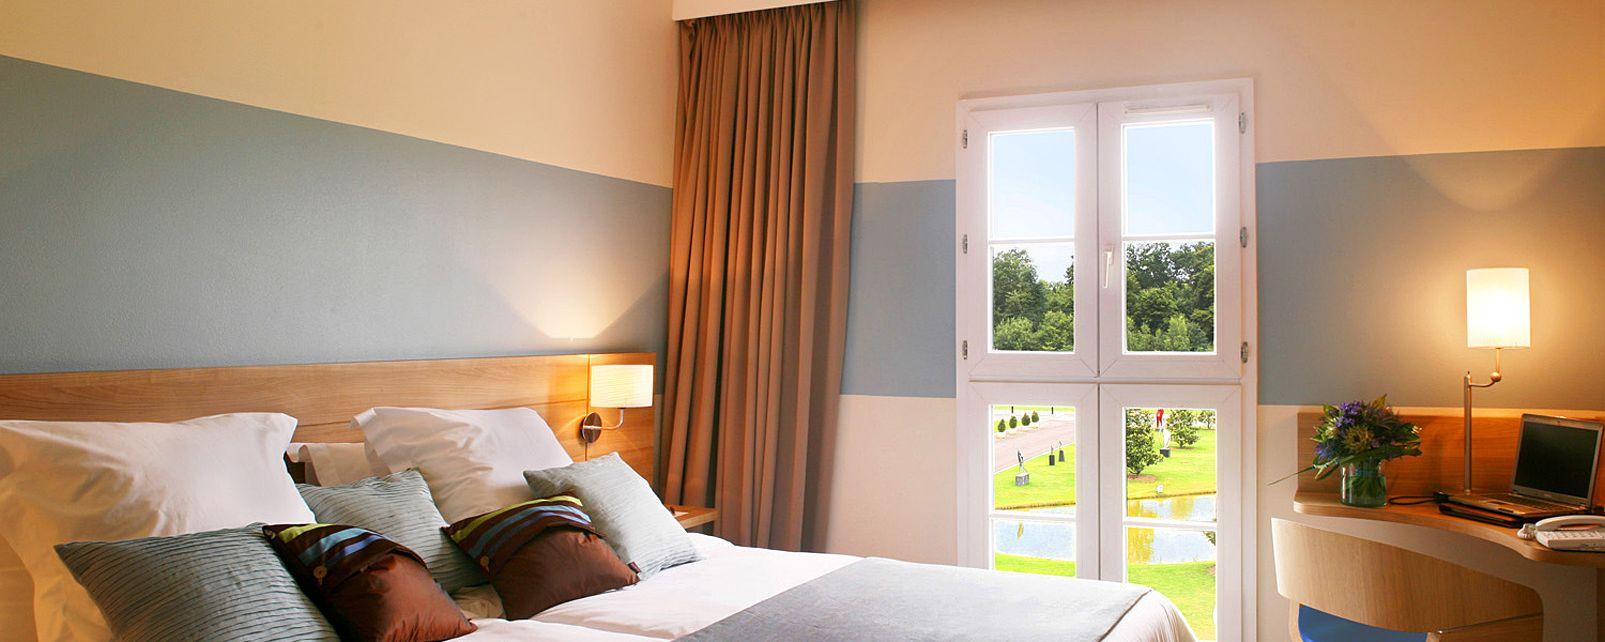 Hôtel Mercure Chantilly Resort Conventions